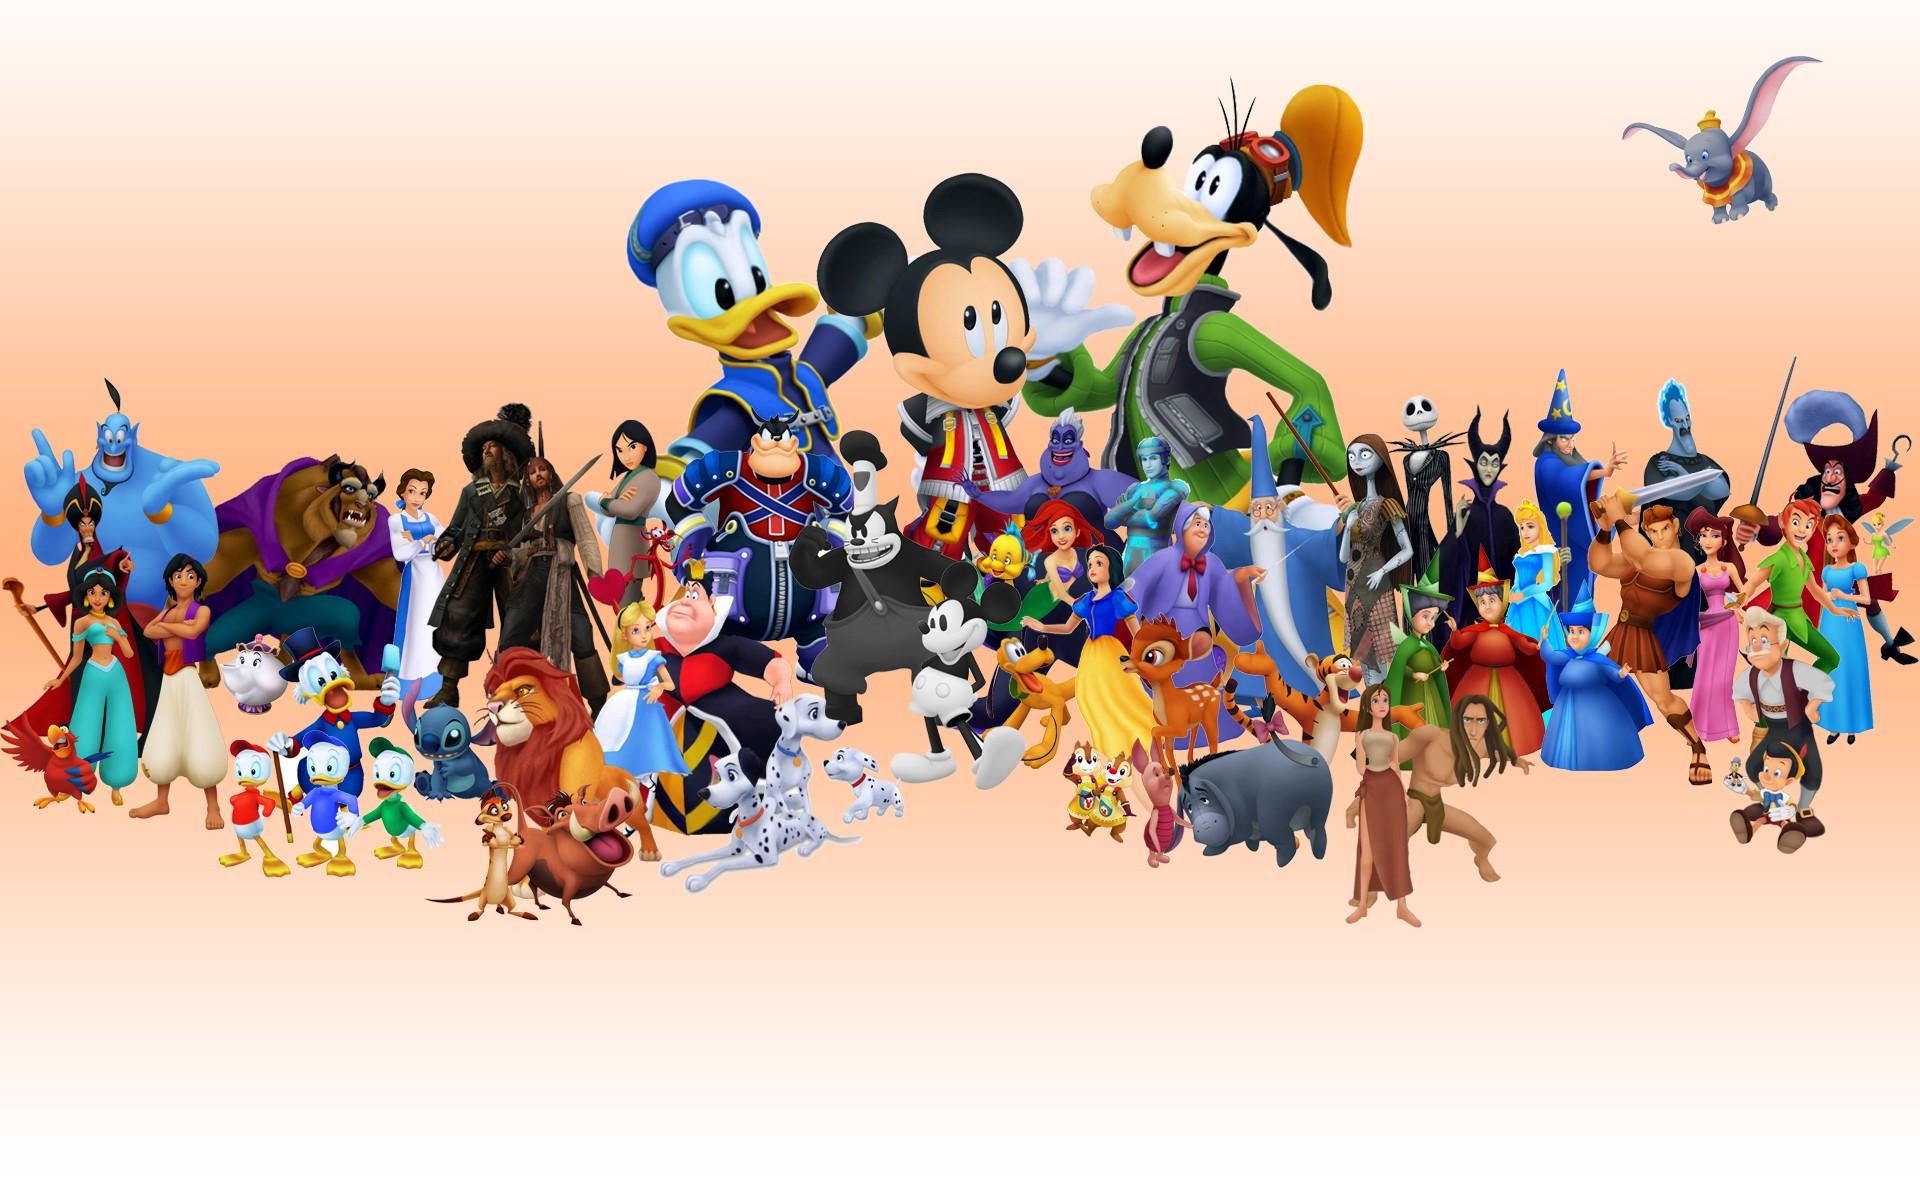 Free Download Free Disney Cartoon Wallpaper Desktop Download Wwwwallpapers In Hd 1920x1200 For Your Desktop Mobile Tablet Explore 48 Free Wallpaper Cartoon Disney Free Disney Wallpaper Downloads Cartoon Wallpapers